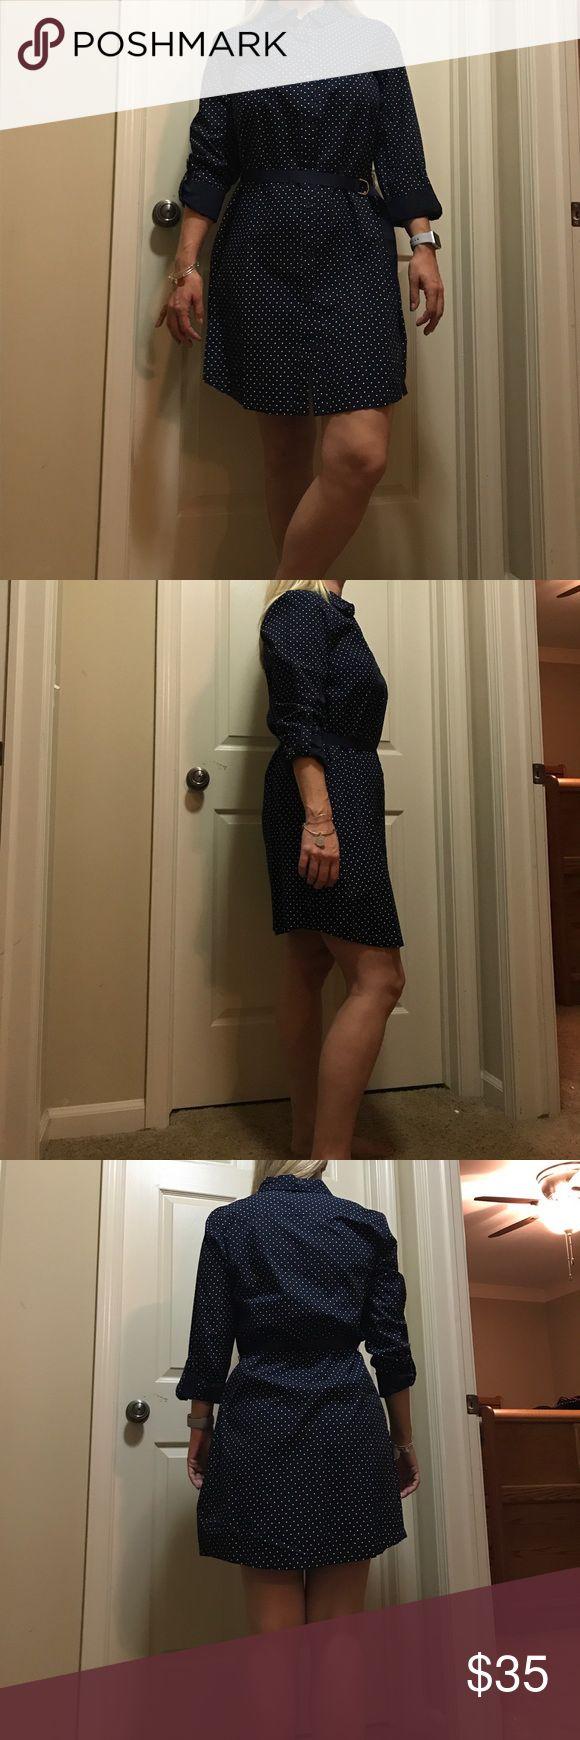 Tommy Hilfiger button down long sleeve dress Cute and lightweight navy long sleeve button down polka dot dress. Belted waist detail to bring out the best assets! Tommy Hilfiger Dresses Long Sleeve